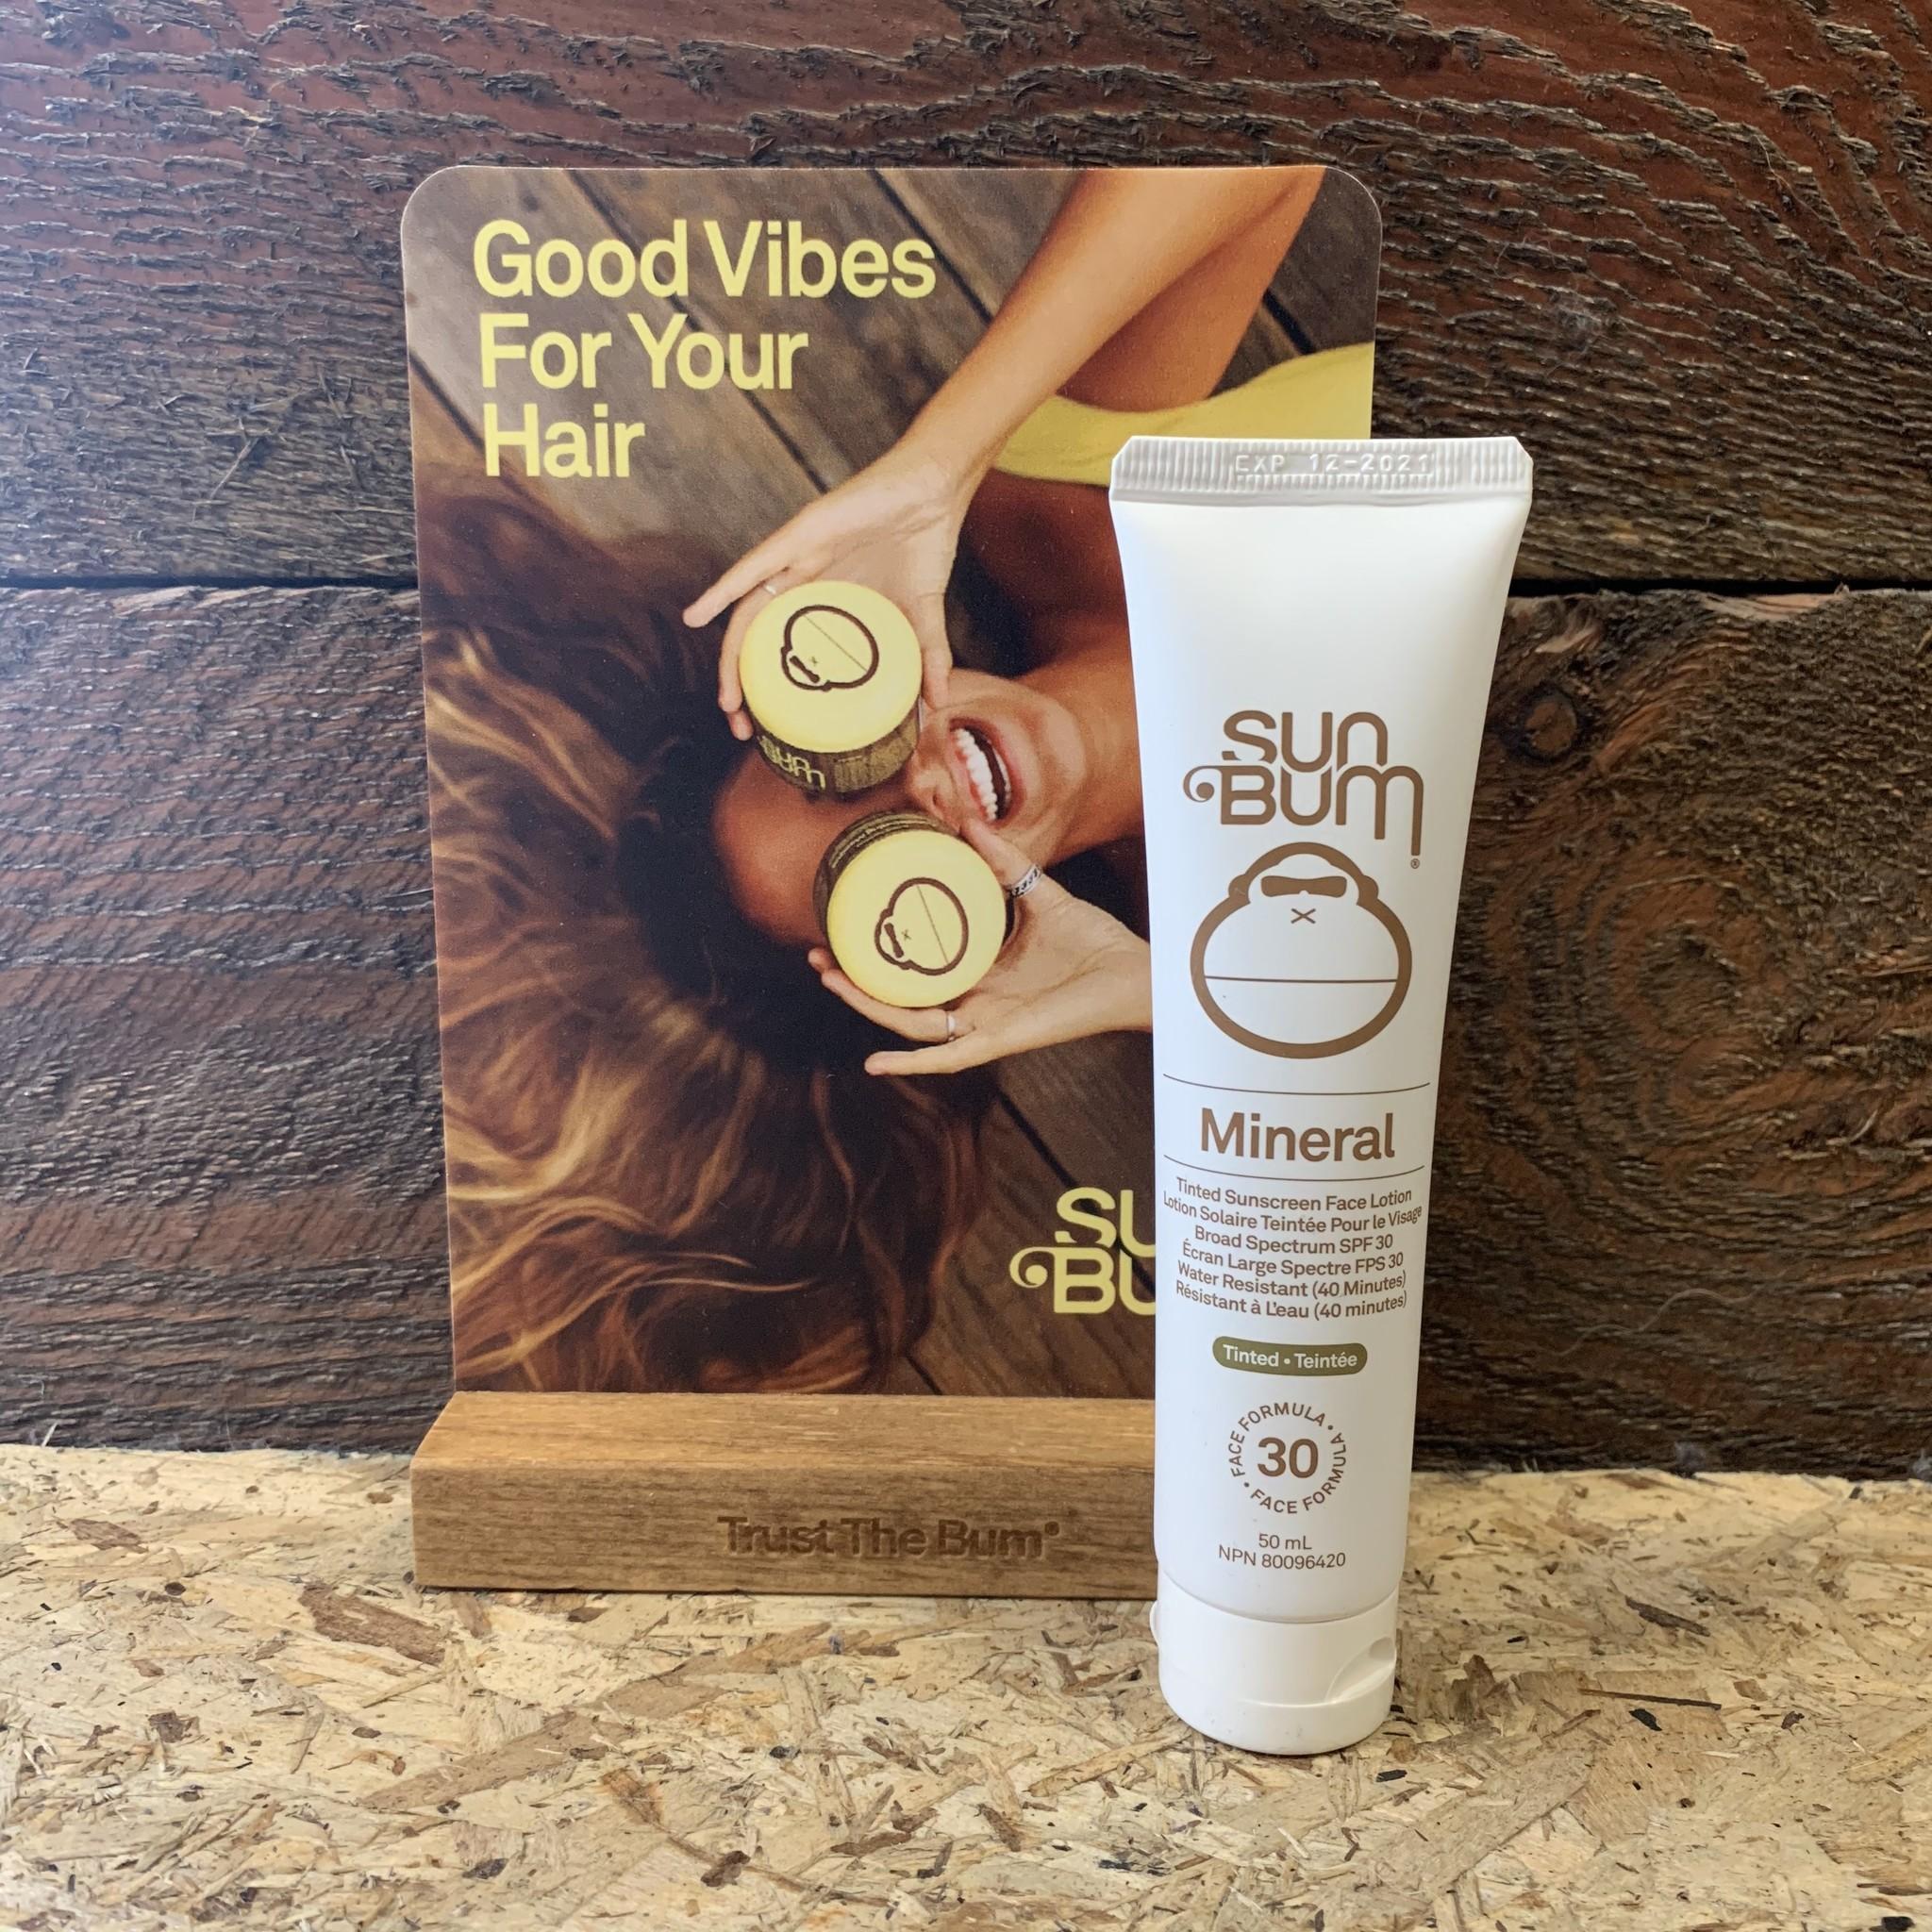 Sun Bum SunBum - Mineral SPF 30 Face Tint